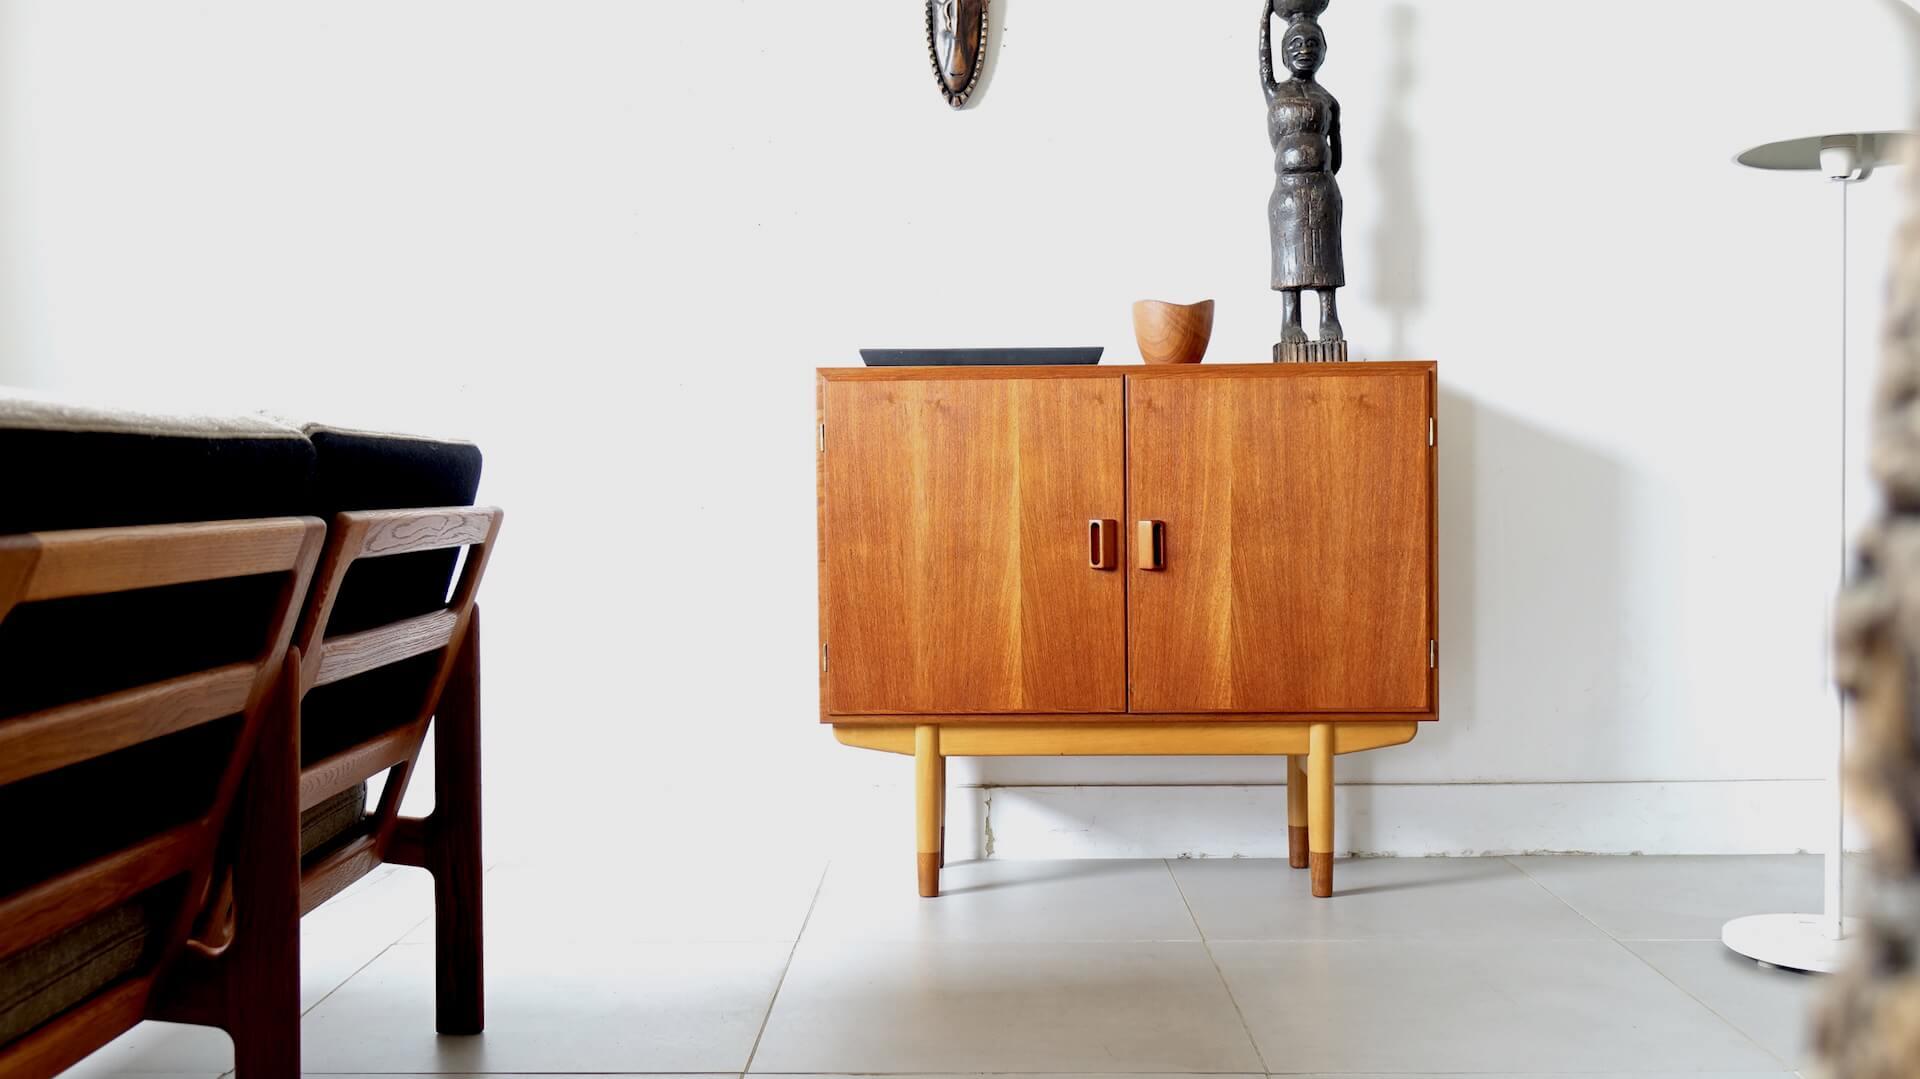 Cabinet by Borge Mogensen